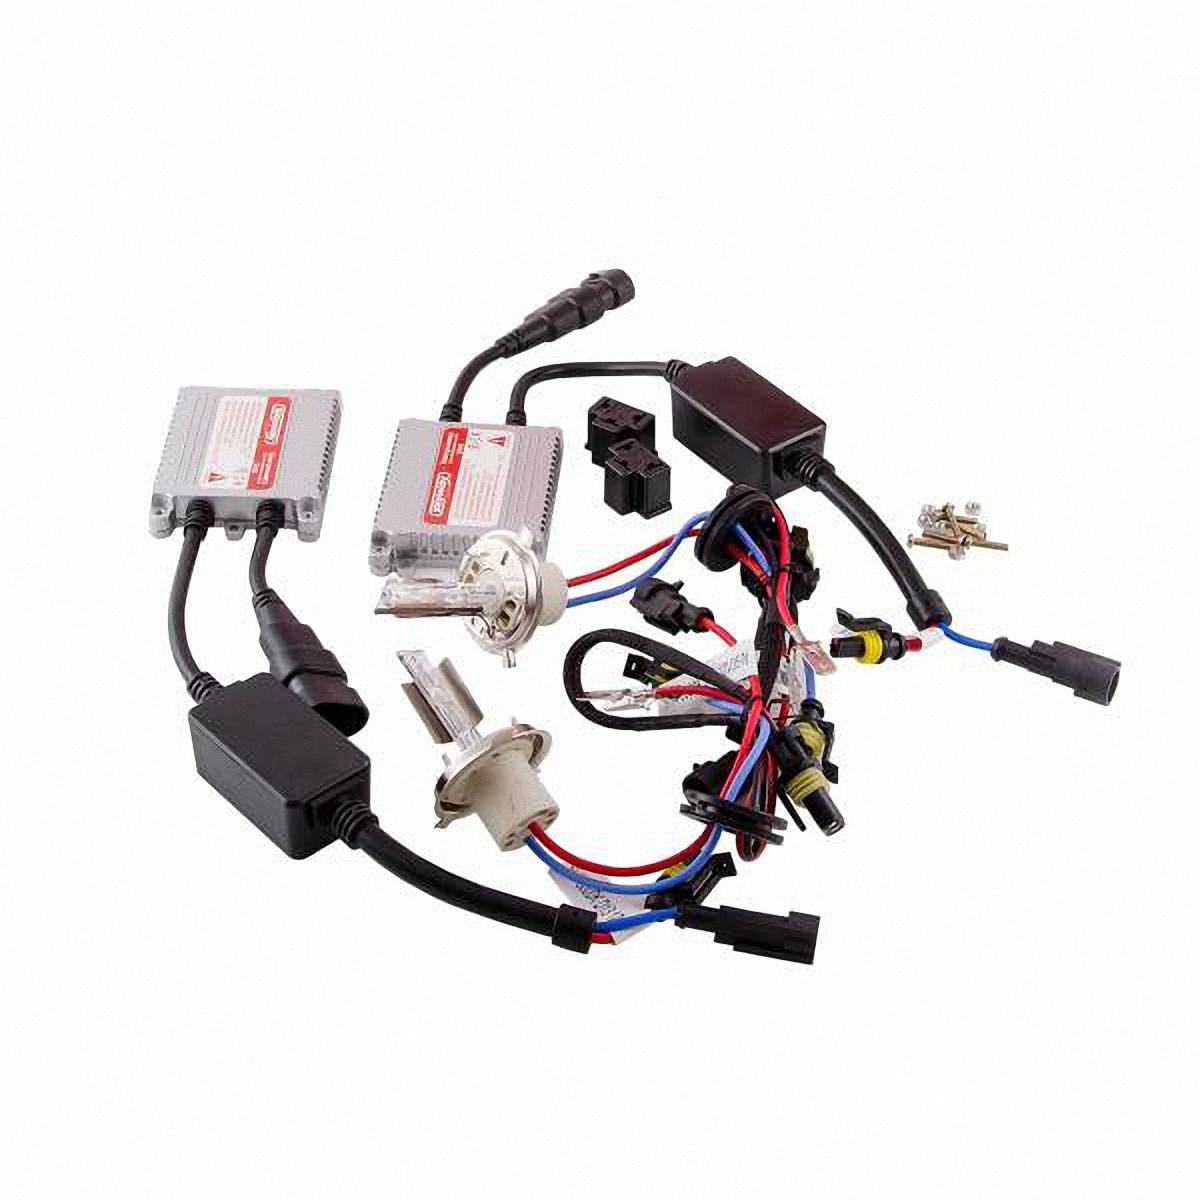 Skyway Автолампа ксенон H4. SH4 5000K D13 12V35WSH4 5000K D13 12V35WКомплектация: Лампа газоразрядная ксеноновая – 2 шт. Блок розжига – 2 шт. Винты для блока розжига – 6 шт. Гарантийный талон – 1 шт. Инструкция - 1 шт.